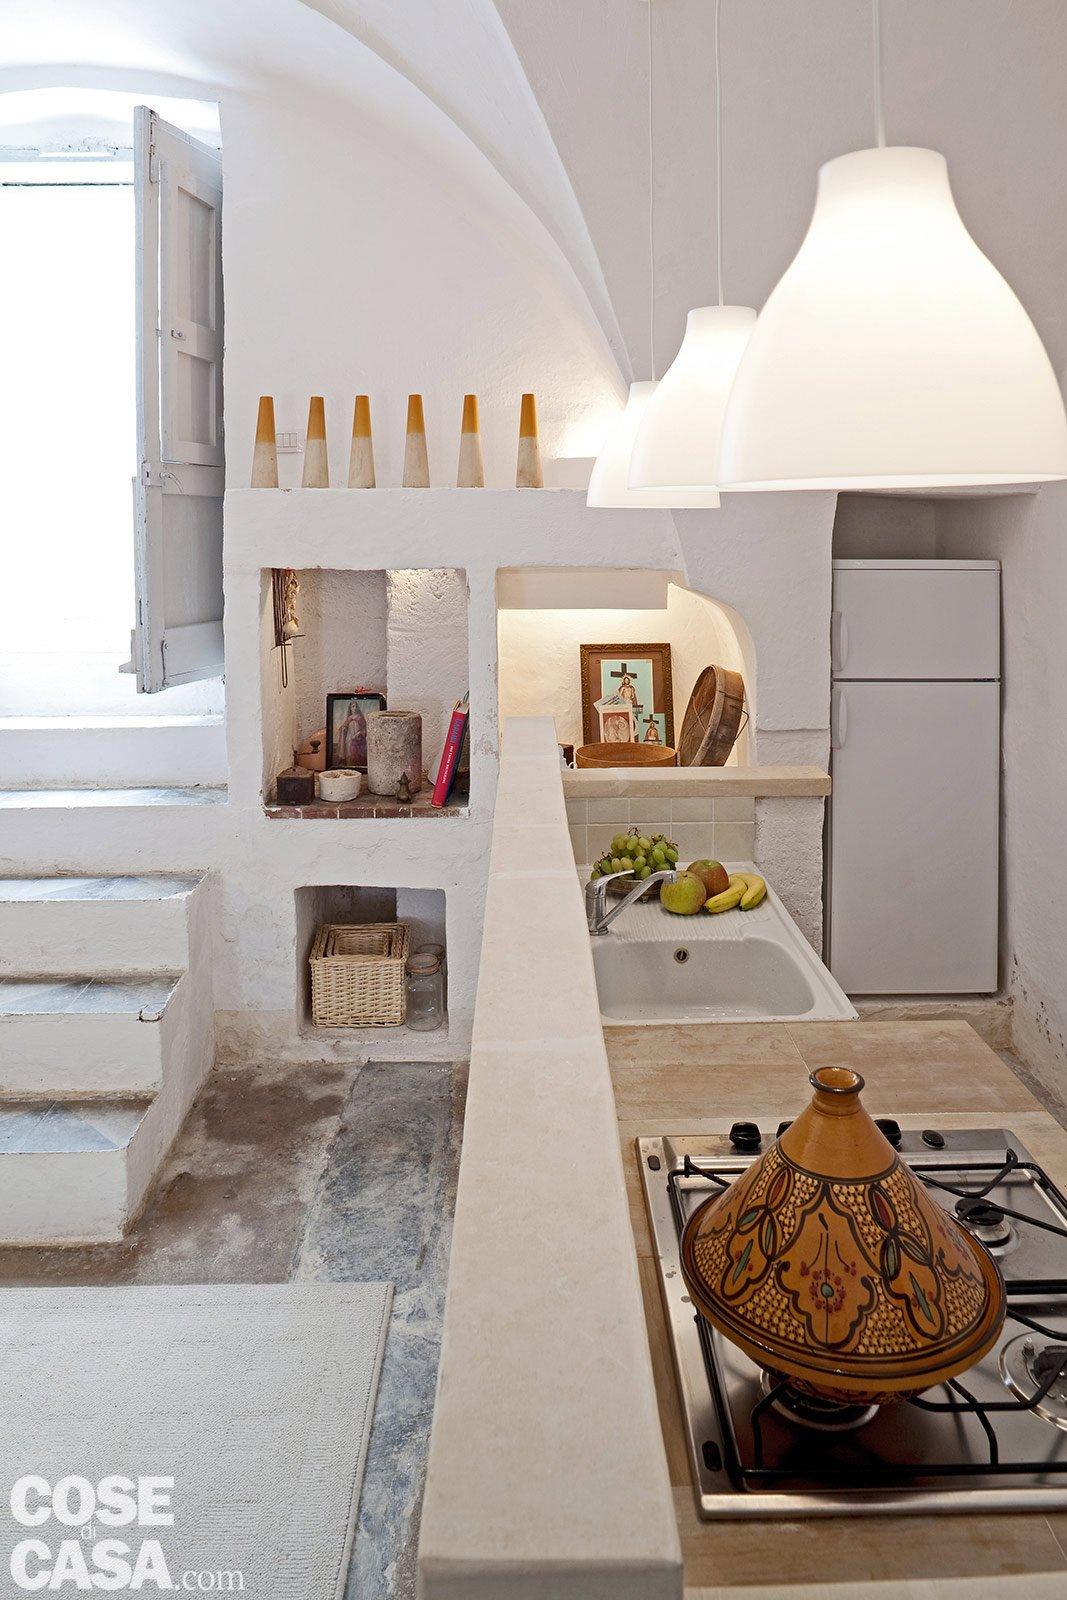 Una casa in pietra in stile mediterraneo cose di casa for Piani di casa in stile rambler